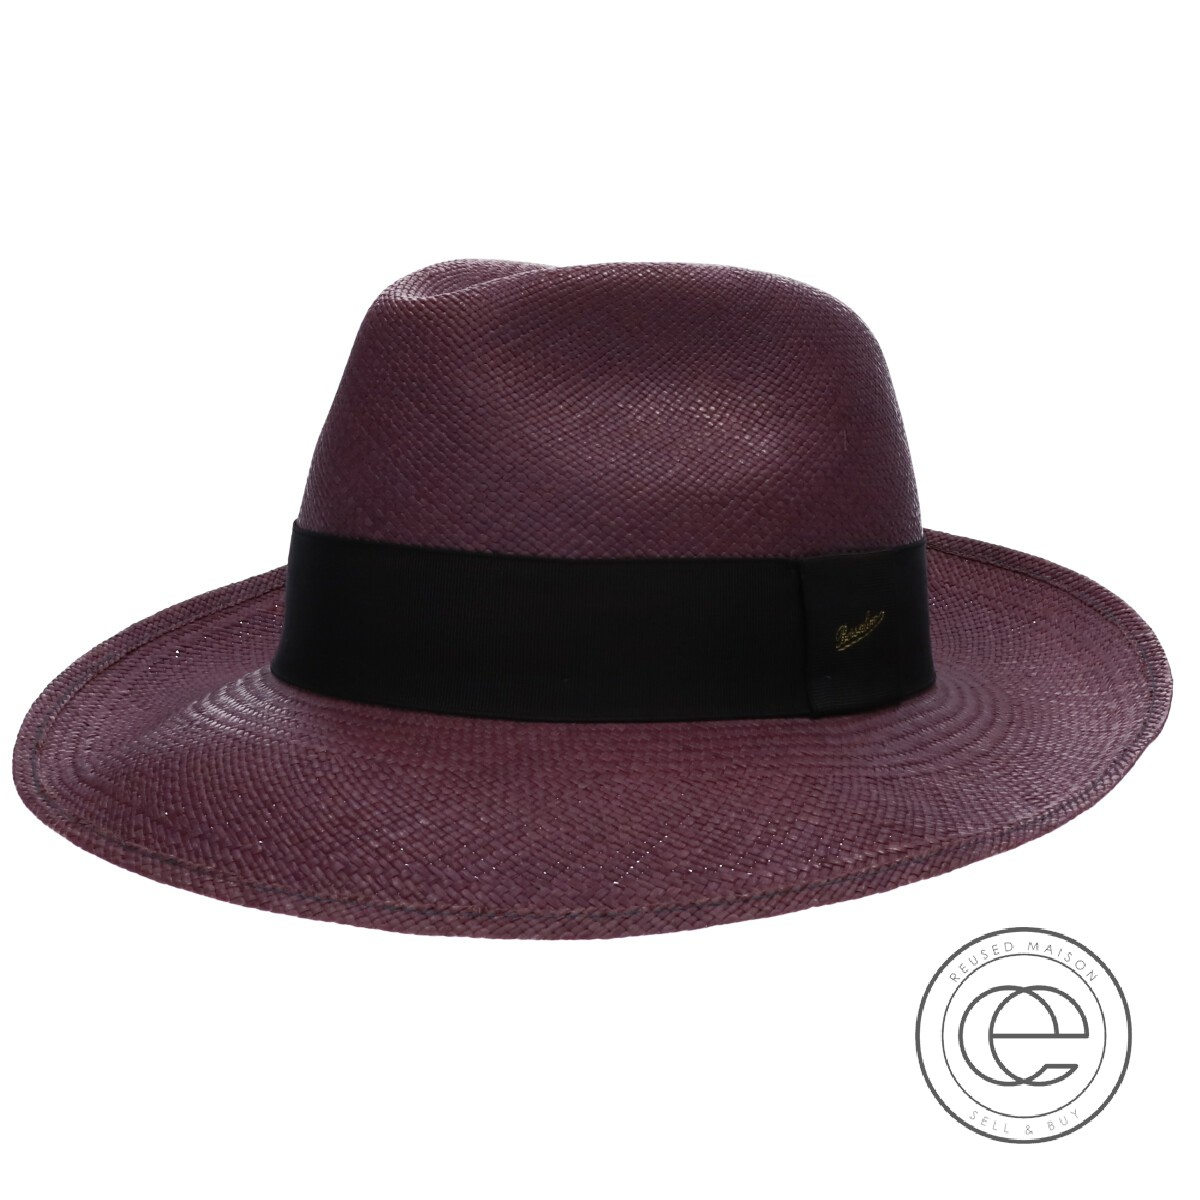 Borsalino ボルサリーノ 140229 中折れパナマハット 帽子 59 アズキ メンズ 【中古】